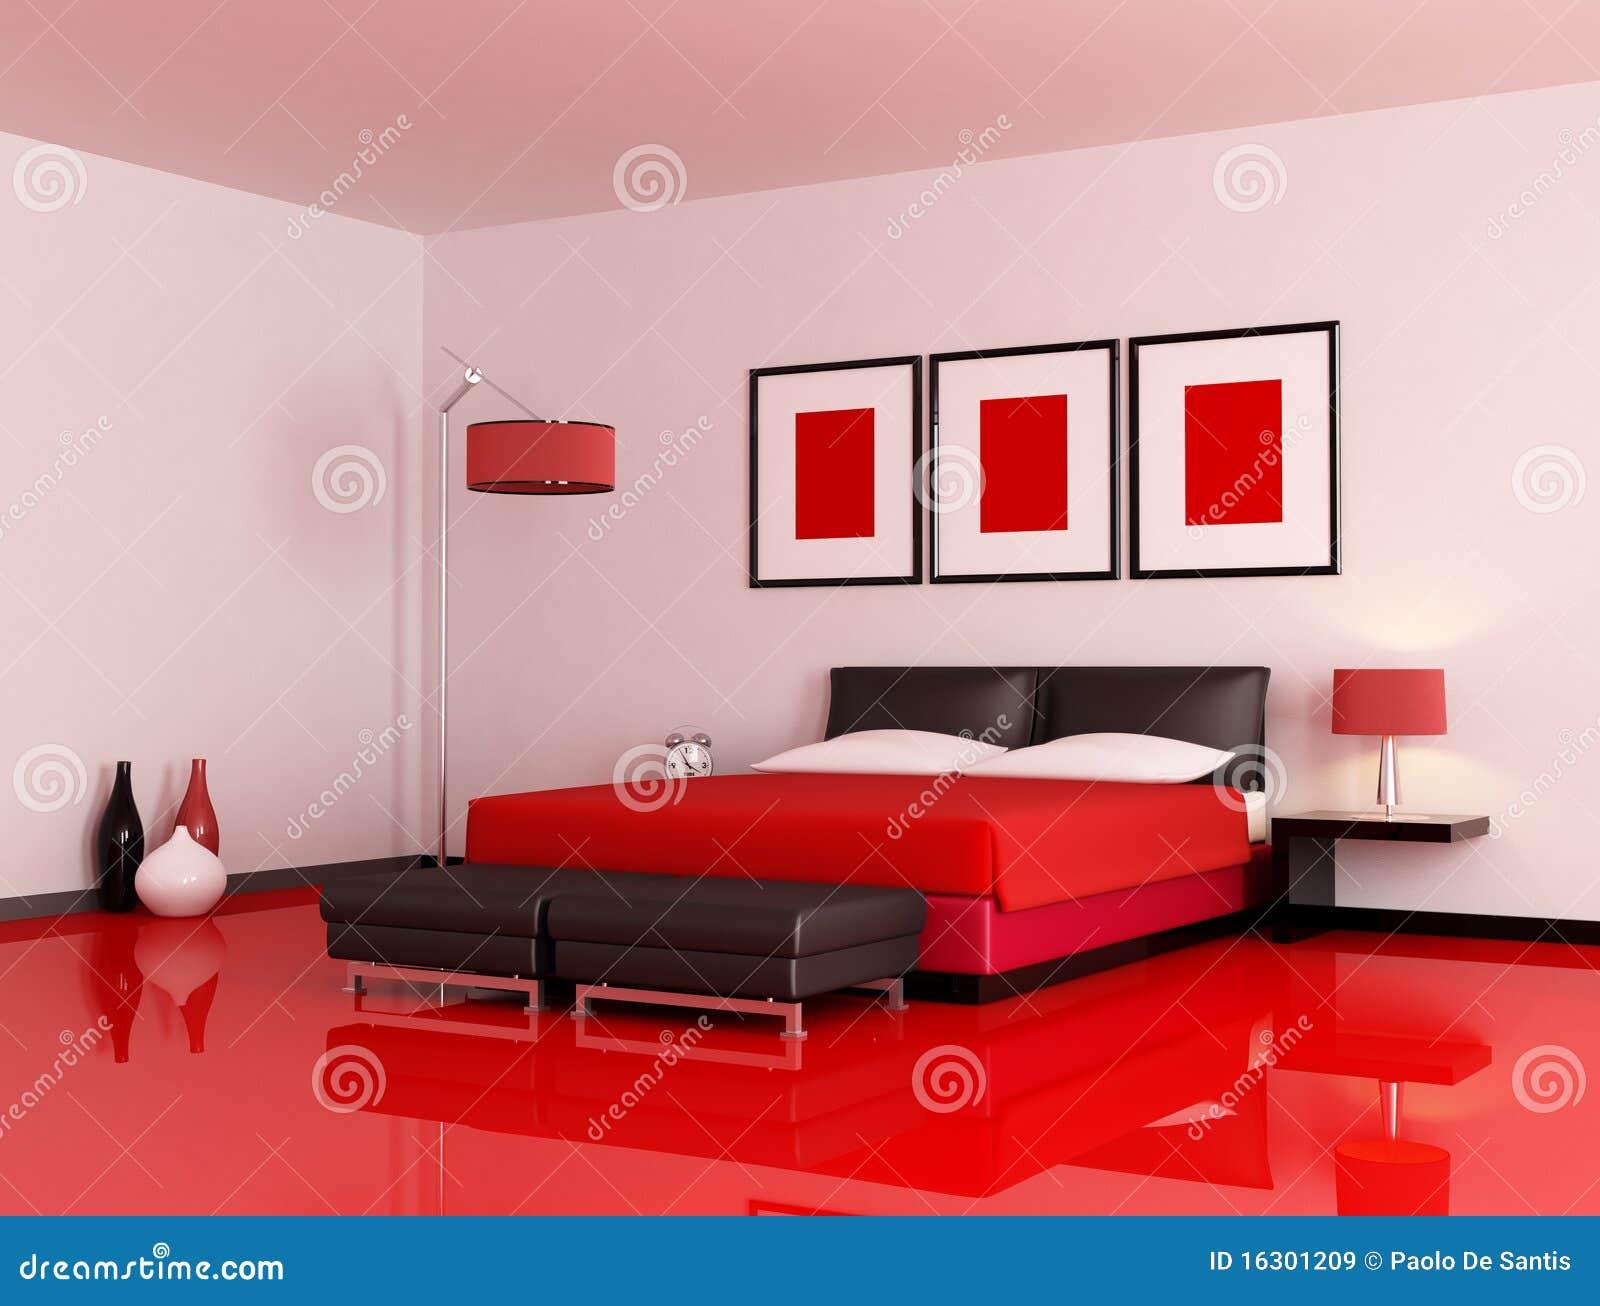 chambre coucher rouge et noire moderne illustration. Black Bedroom Furniture Sets. Home Design Ideas